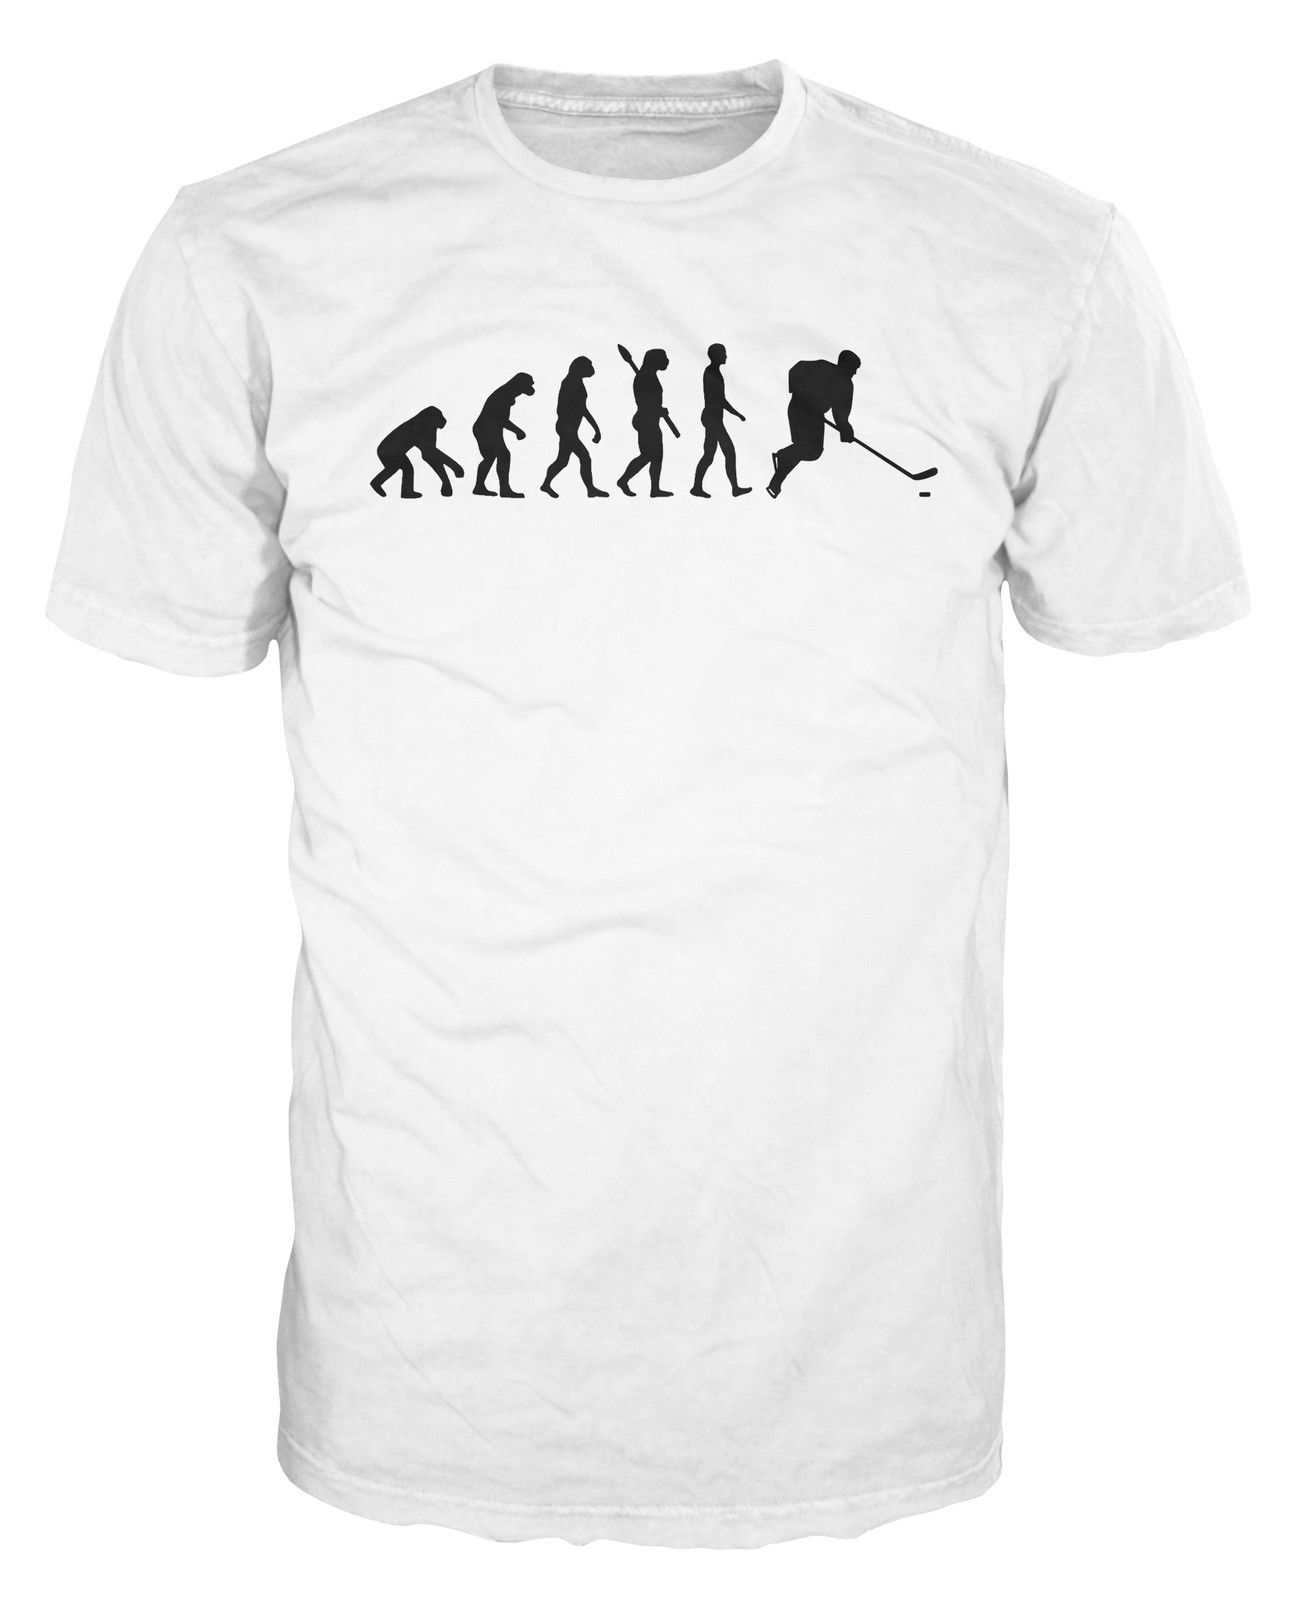 2019 été marque adultes T-Shirt décontracté chemise glace Hockeyer évolution drôle glace-Hockeyer Icehockey métal t-shirts